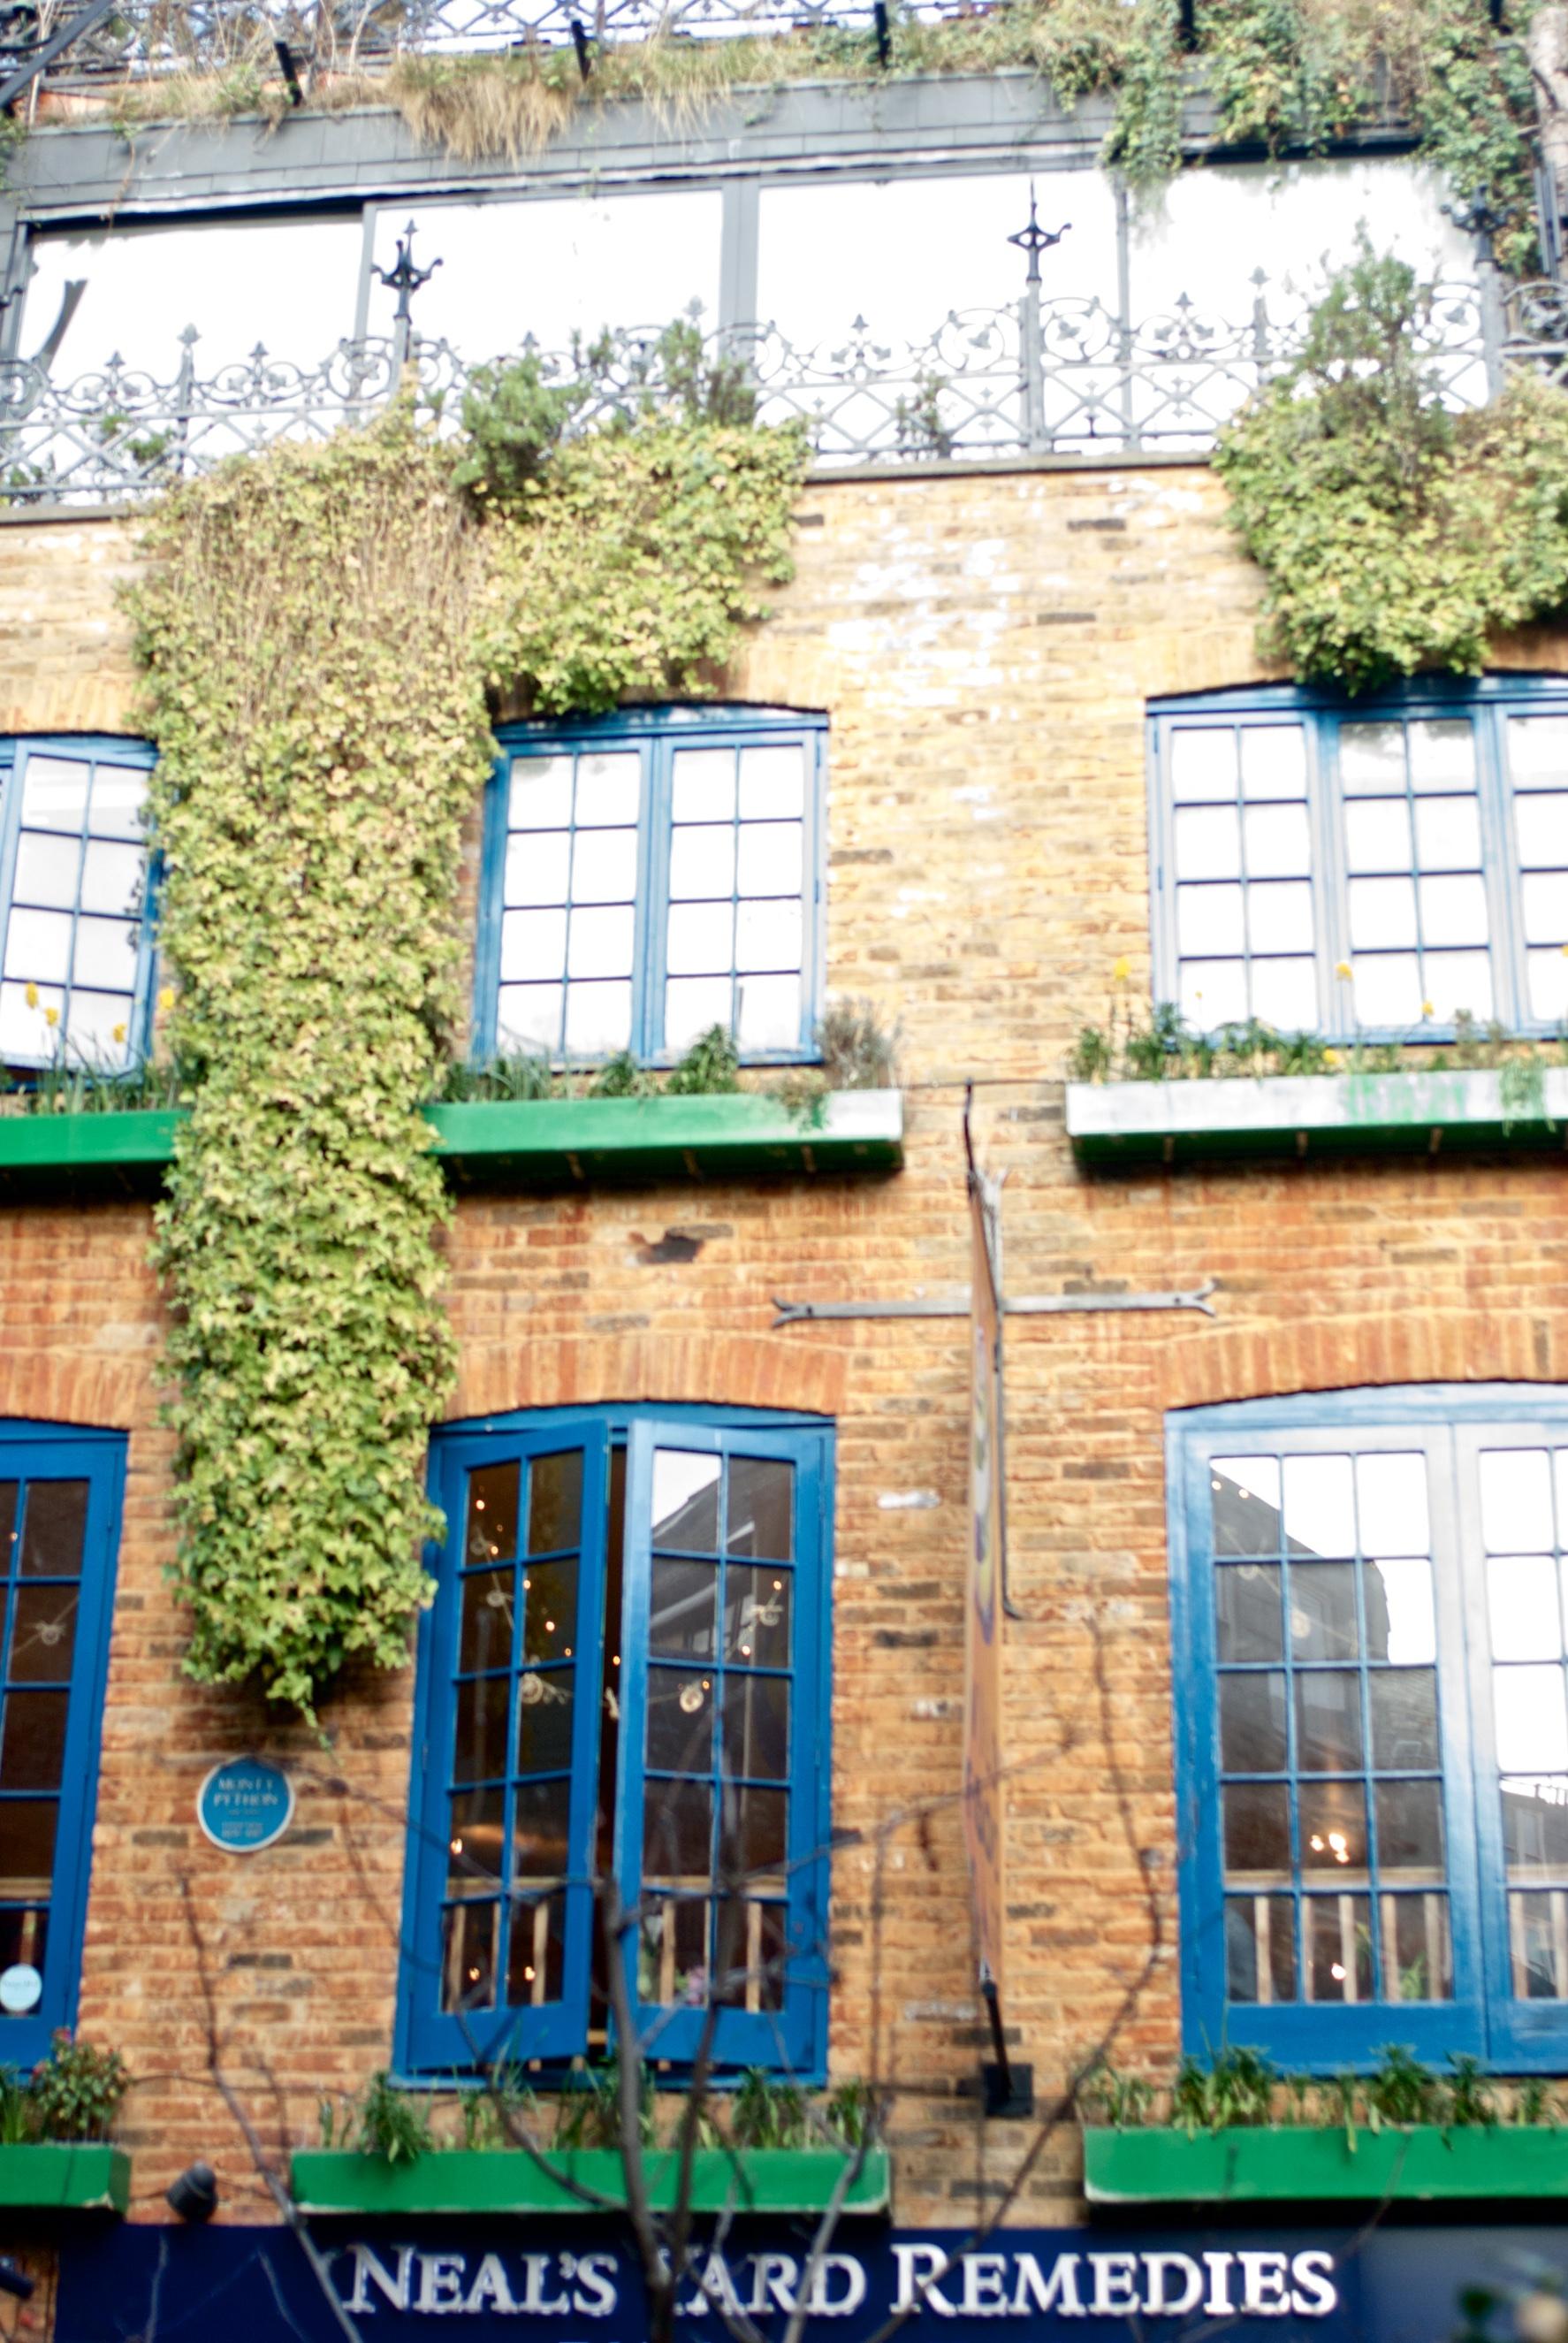 Londres. Neil's Yard